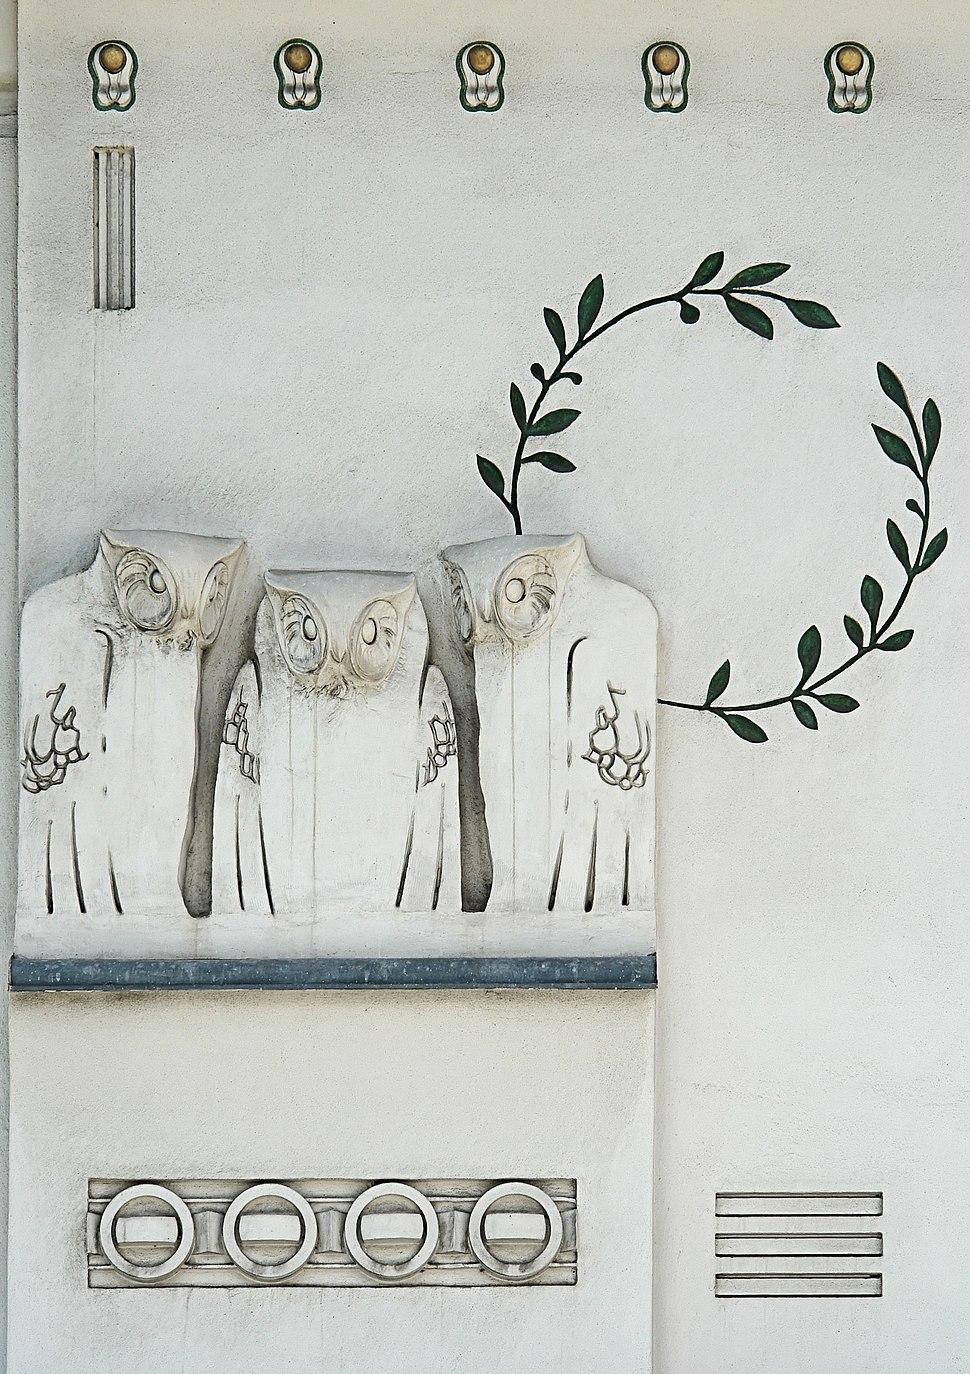 Jugendstil owls - Koloman Moser - Detail facade of Secession Building - Vienna